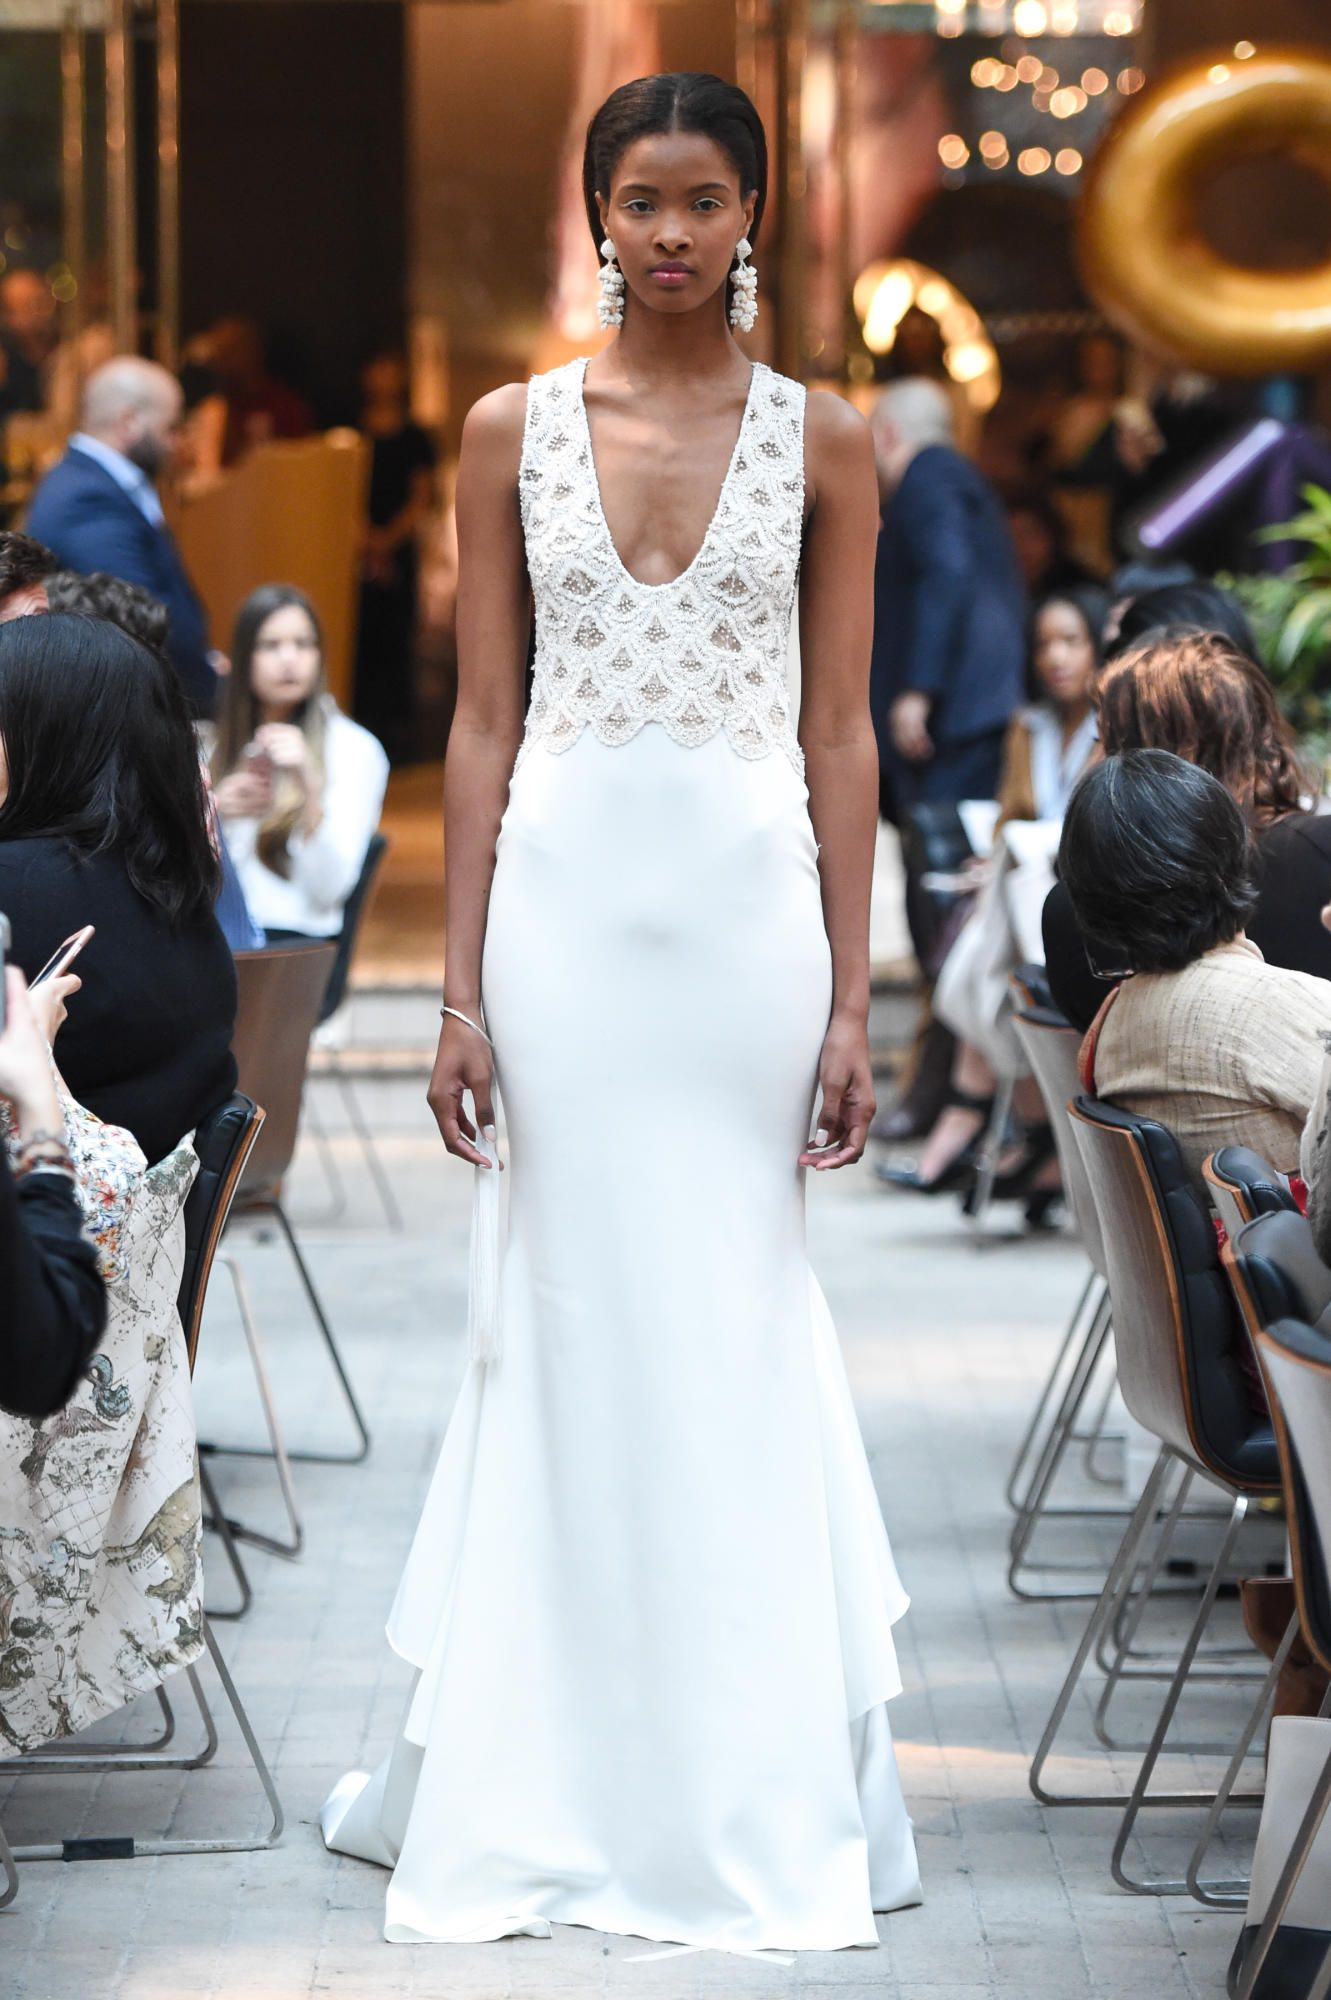 sachin-and-babi-spring-2018-bridal-deco-gown Tendências de vestidos de noiva para 2018